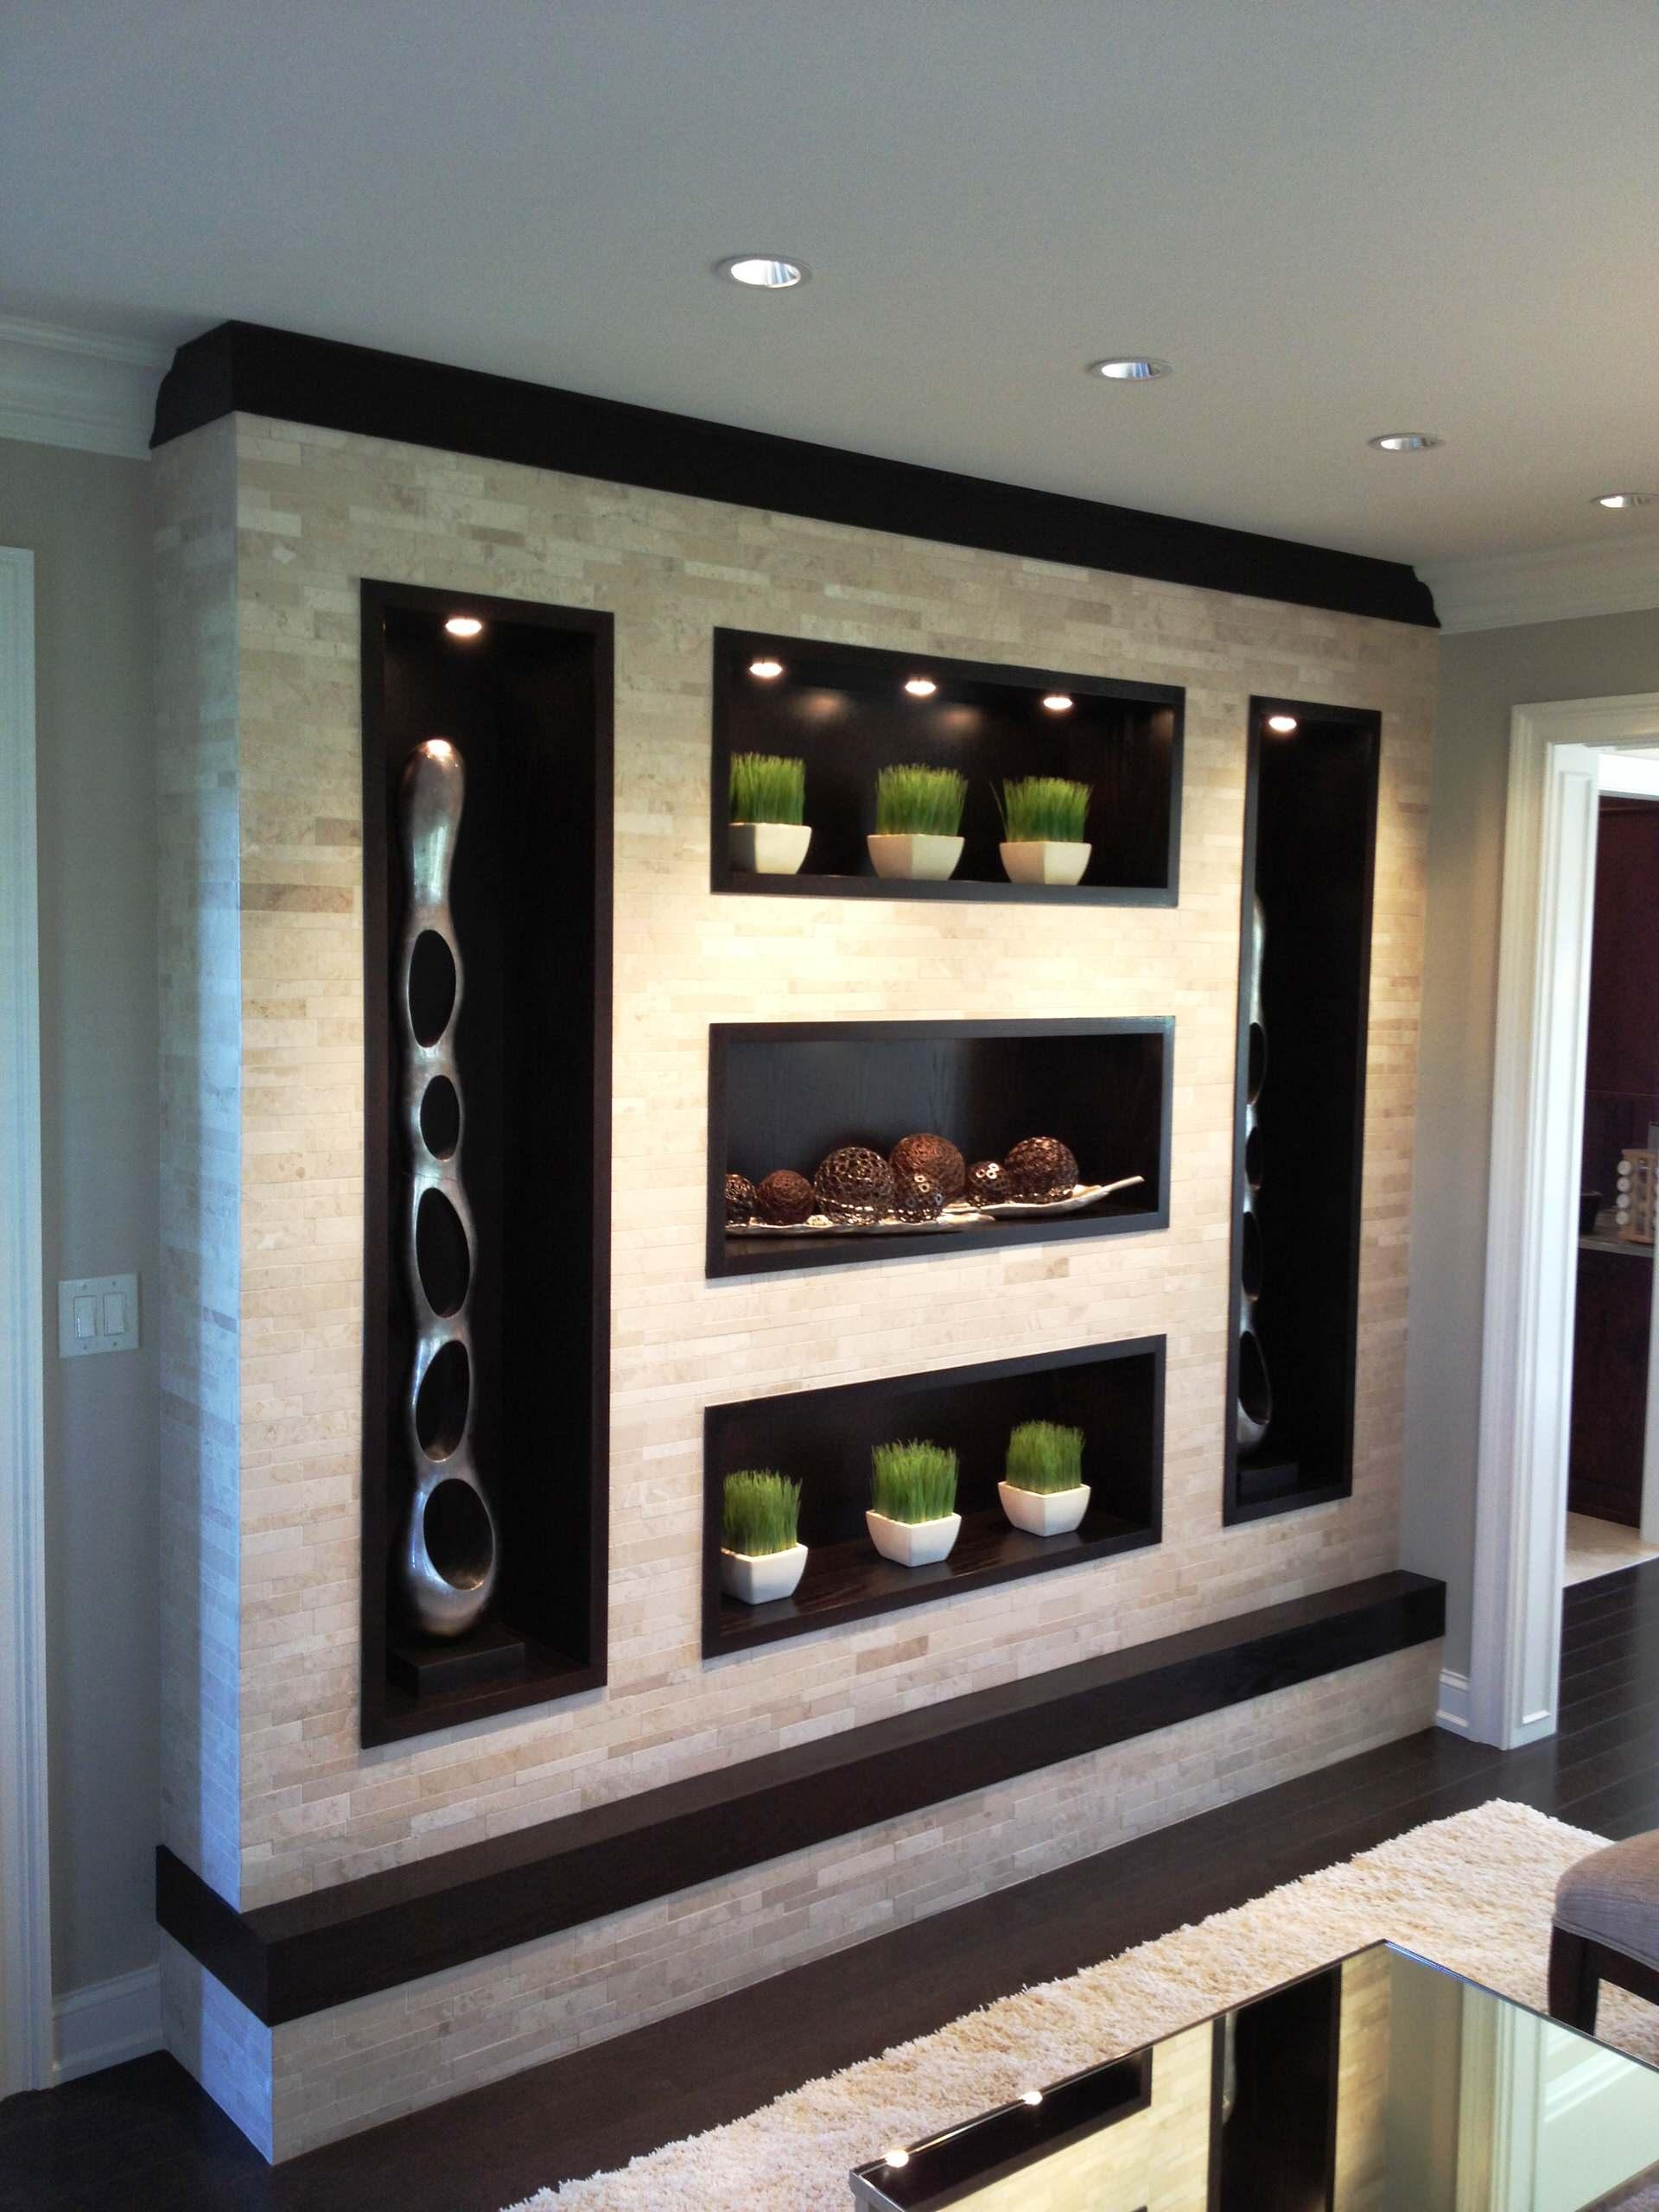 Living Room Wall Unit Houzz, Living Room Wall Unit Ideas